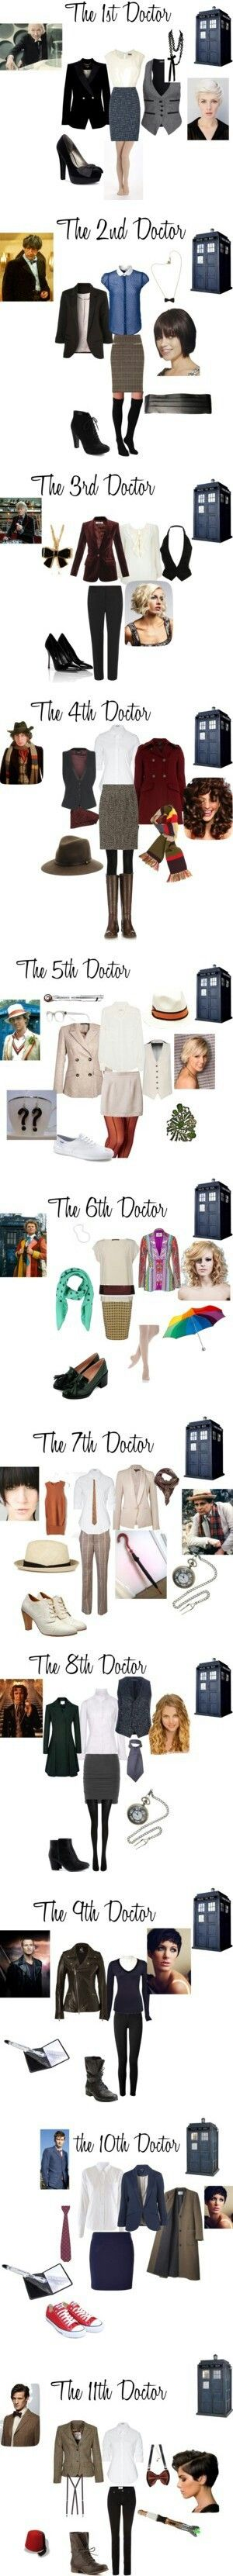 The doctors!